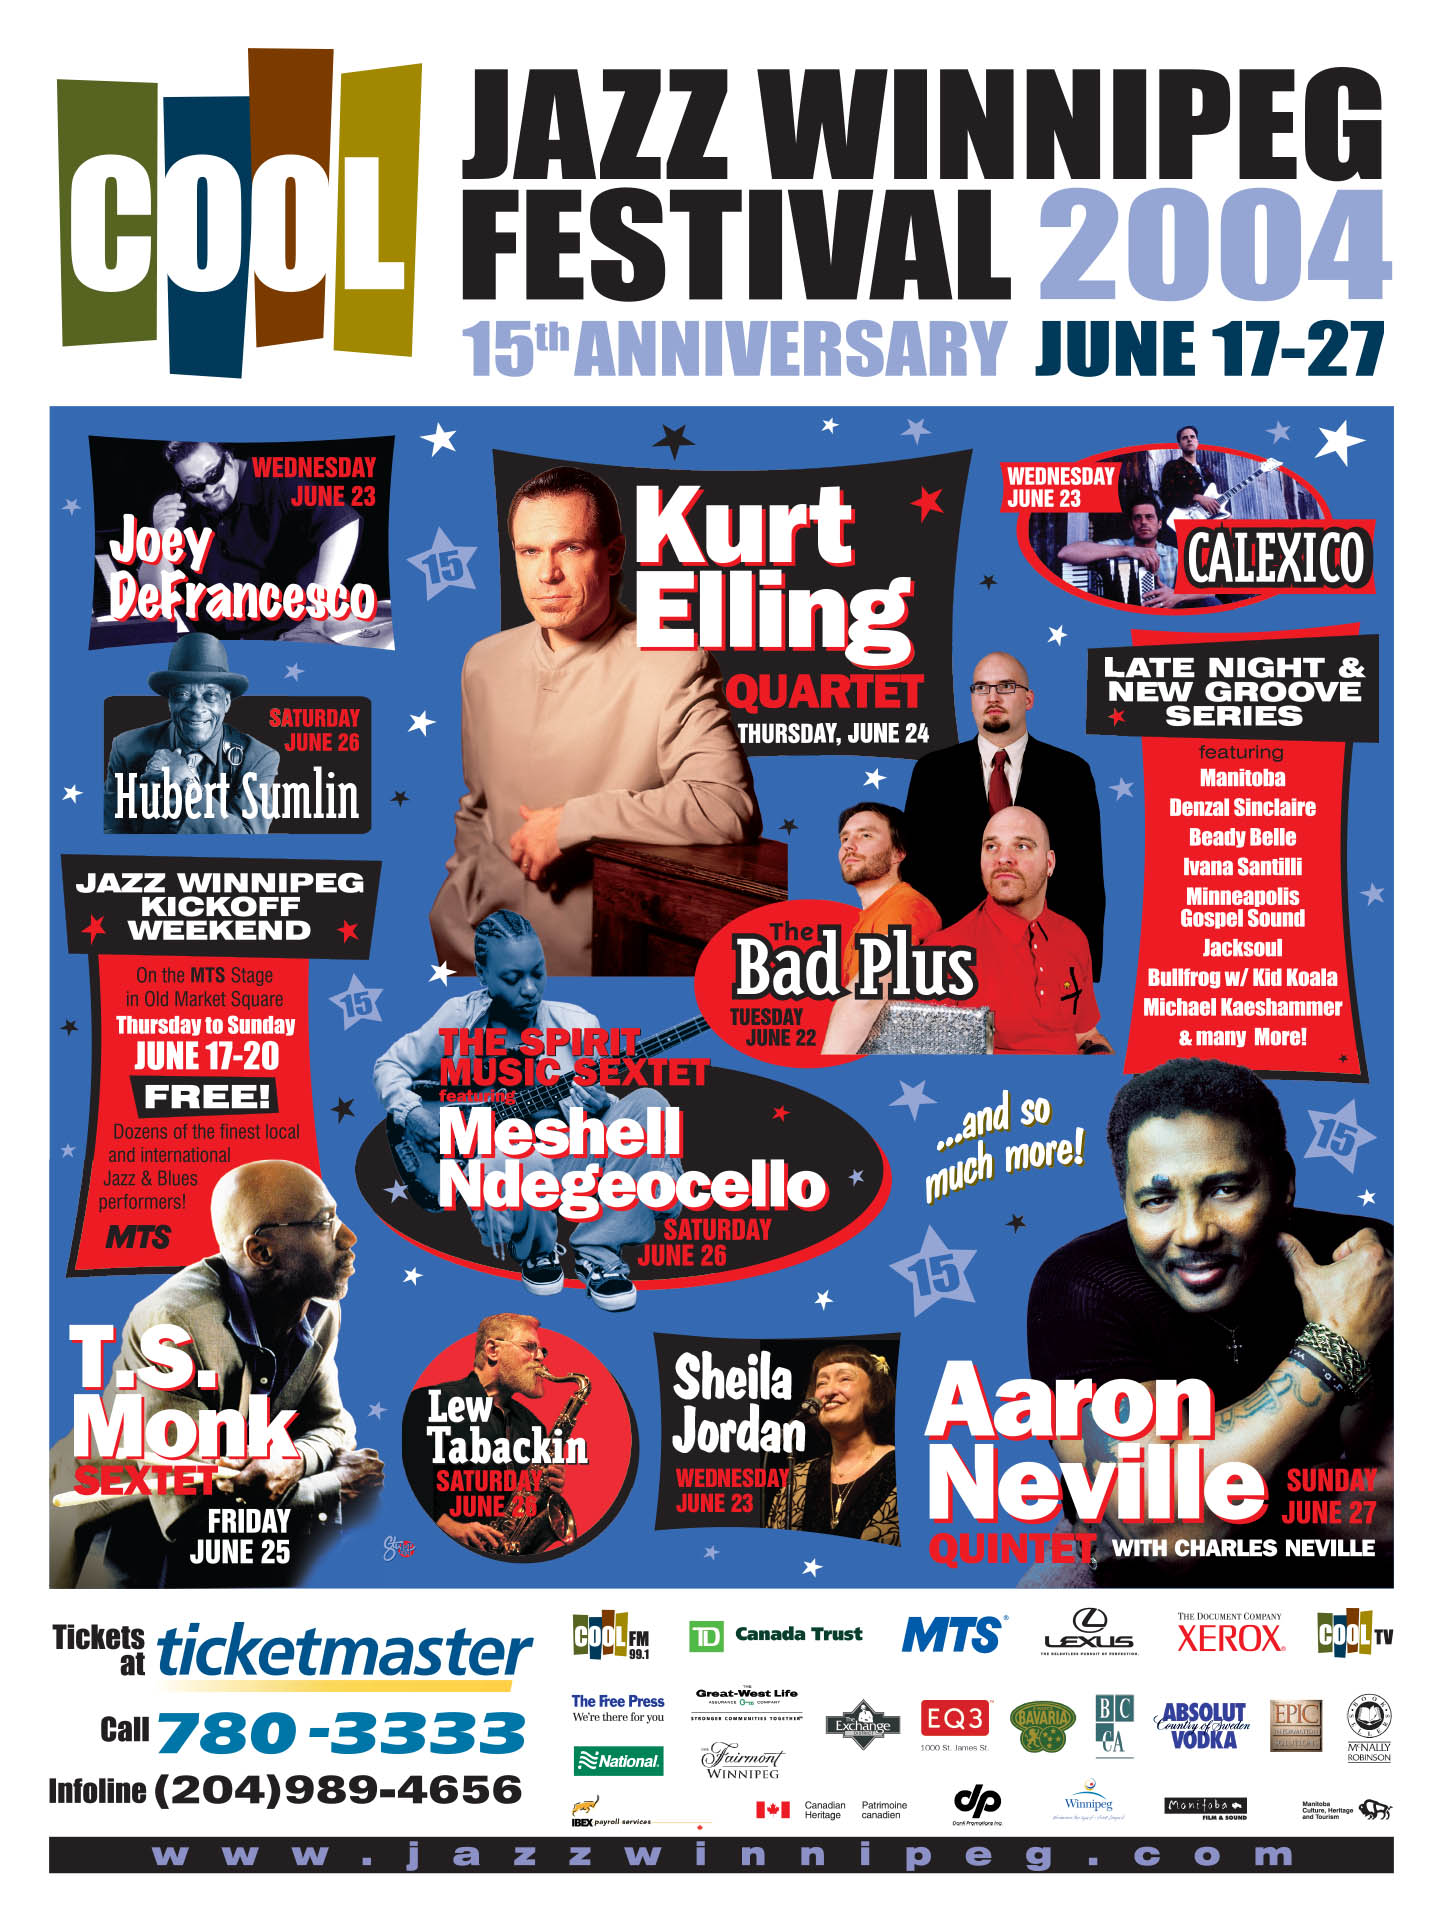 Jazz Winnipeg Festival – 2004